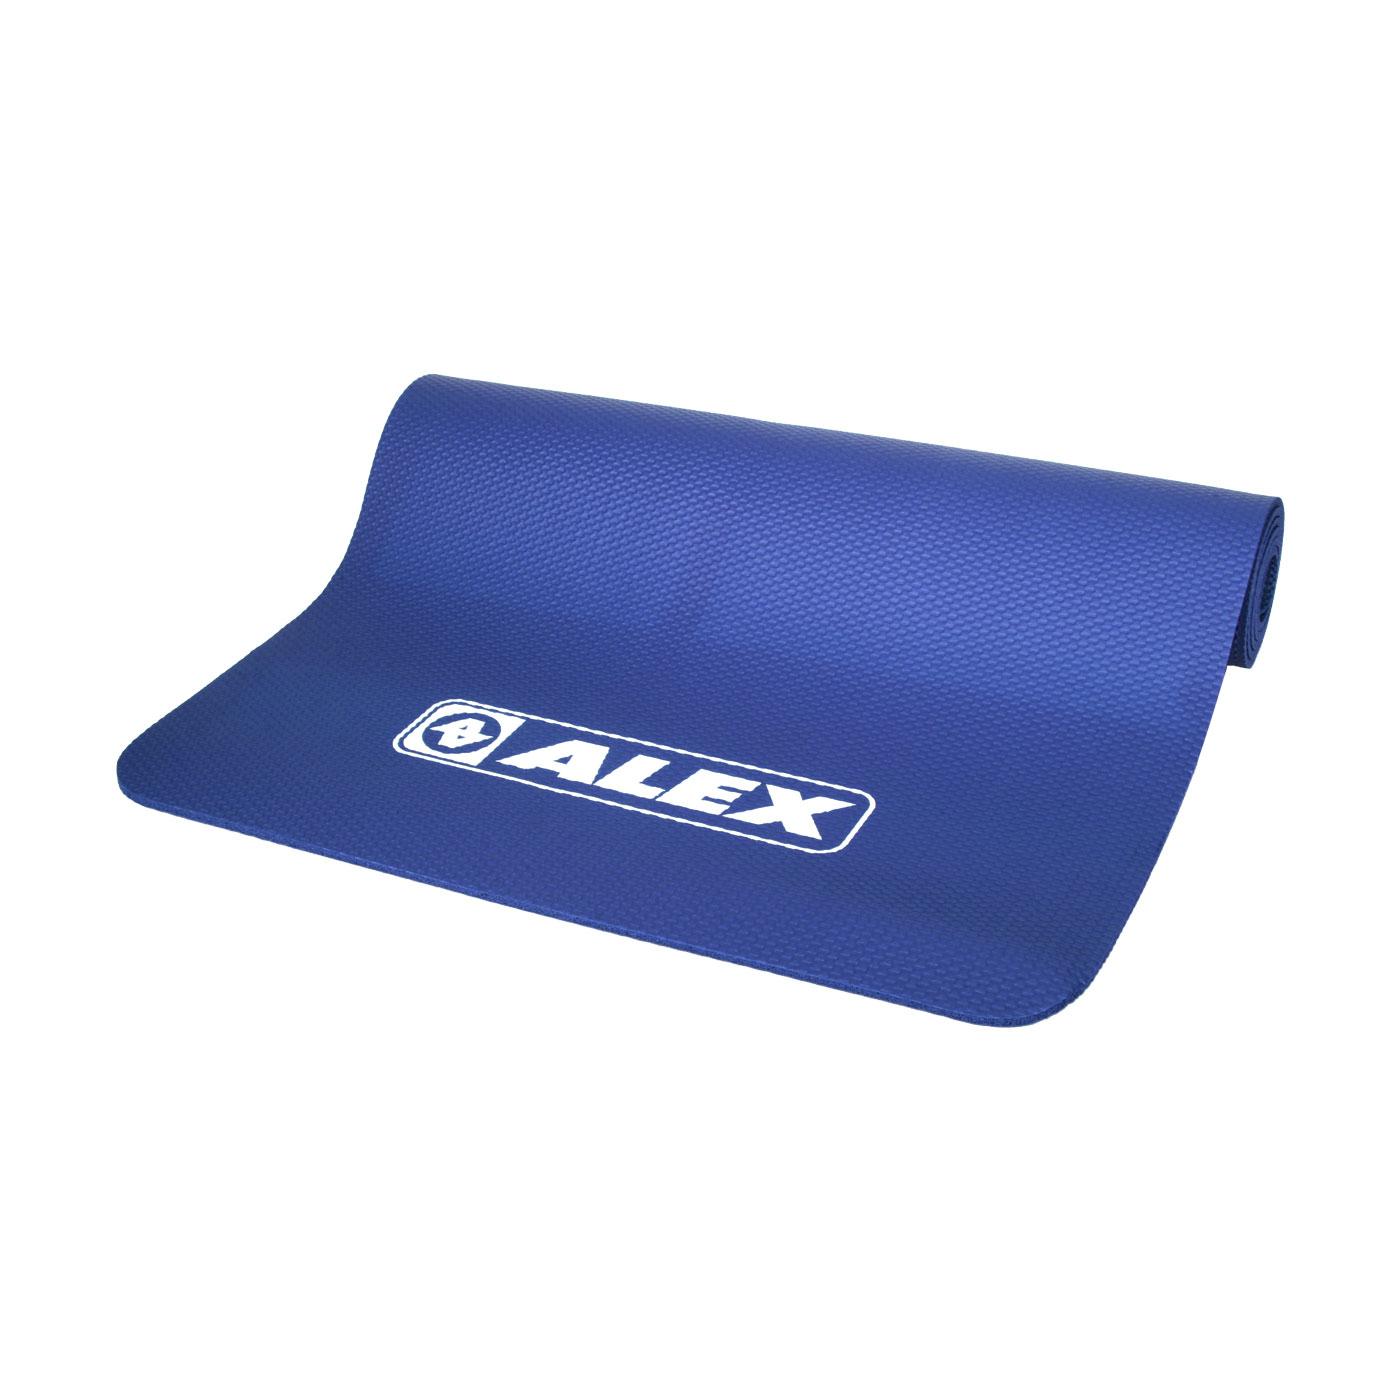 ALEX 專業瑜珈墊 C-1812-1 - 深藍白